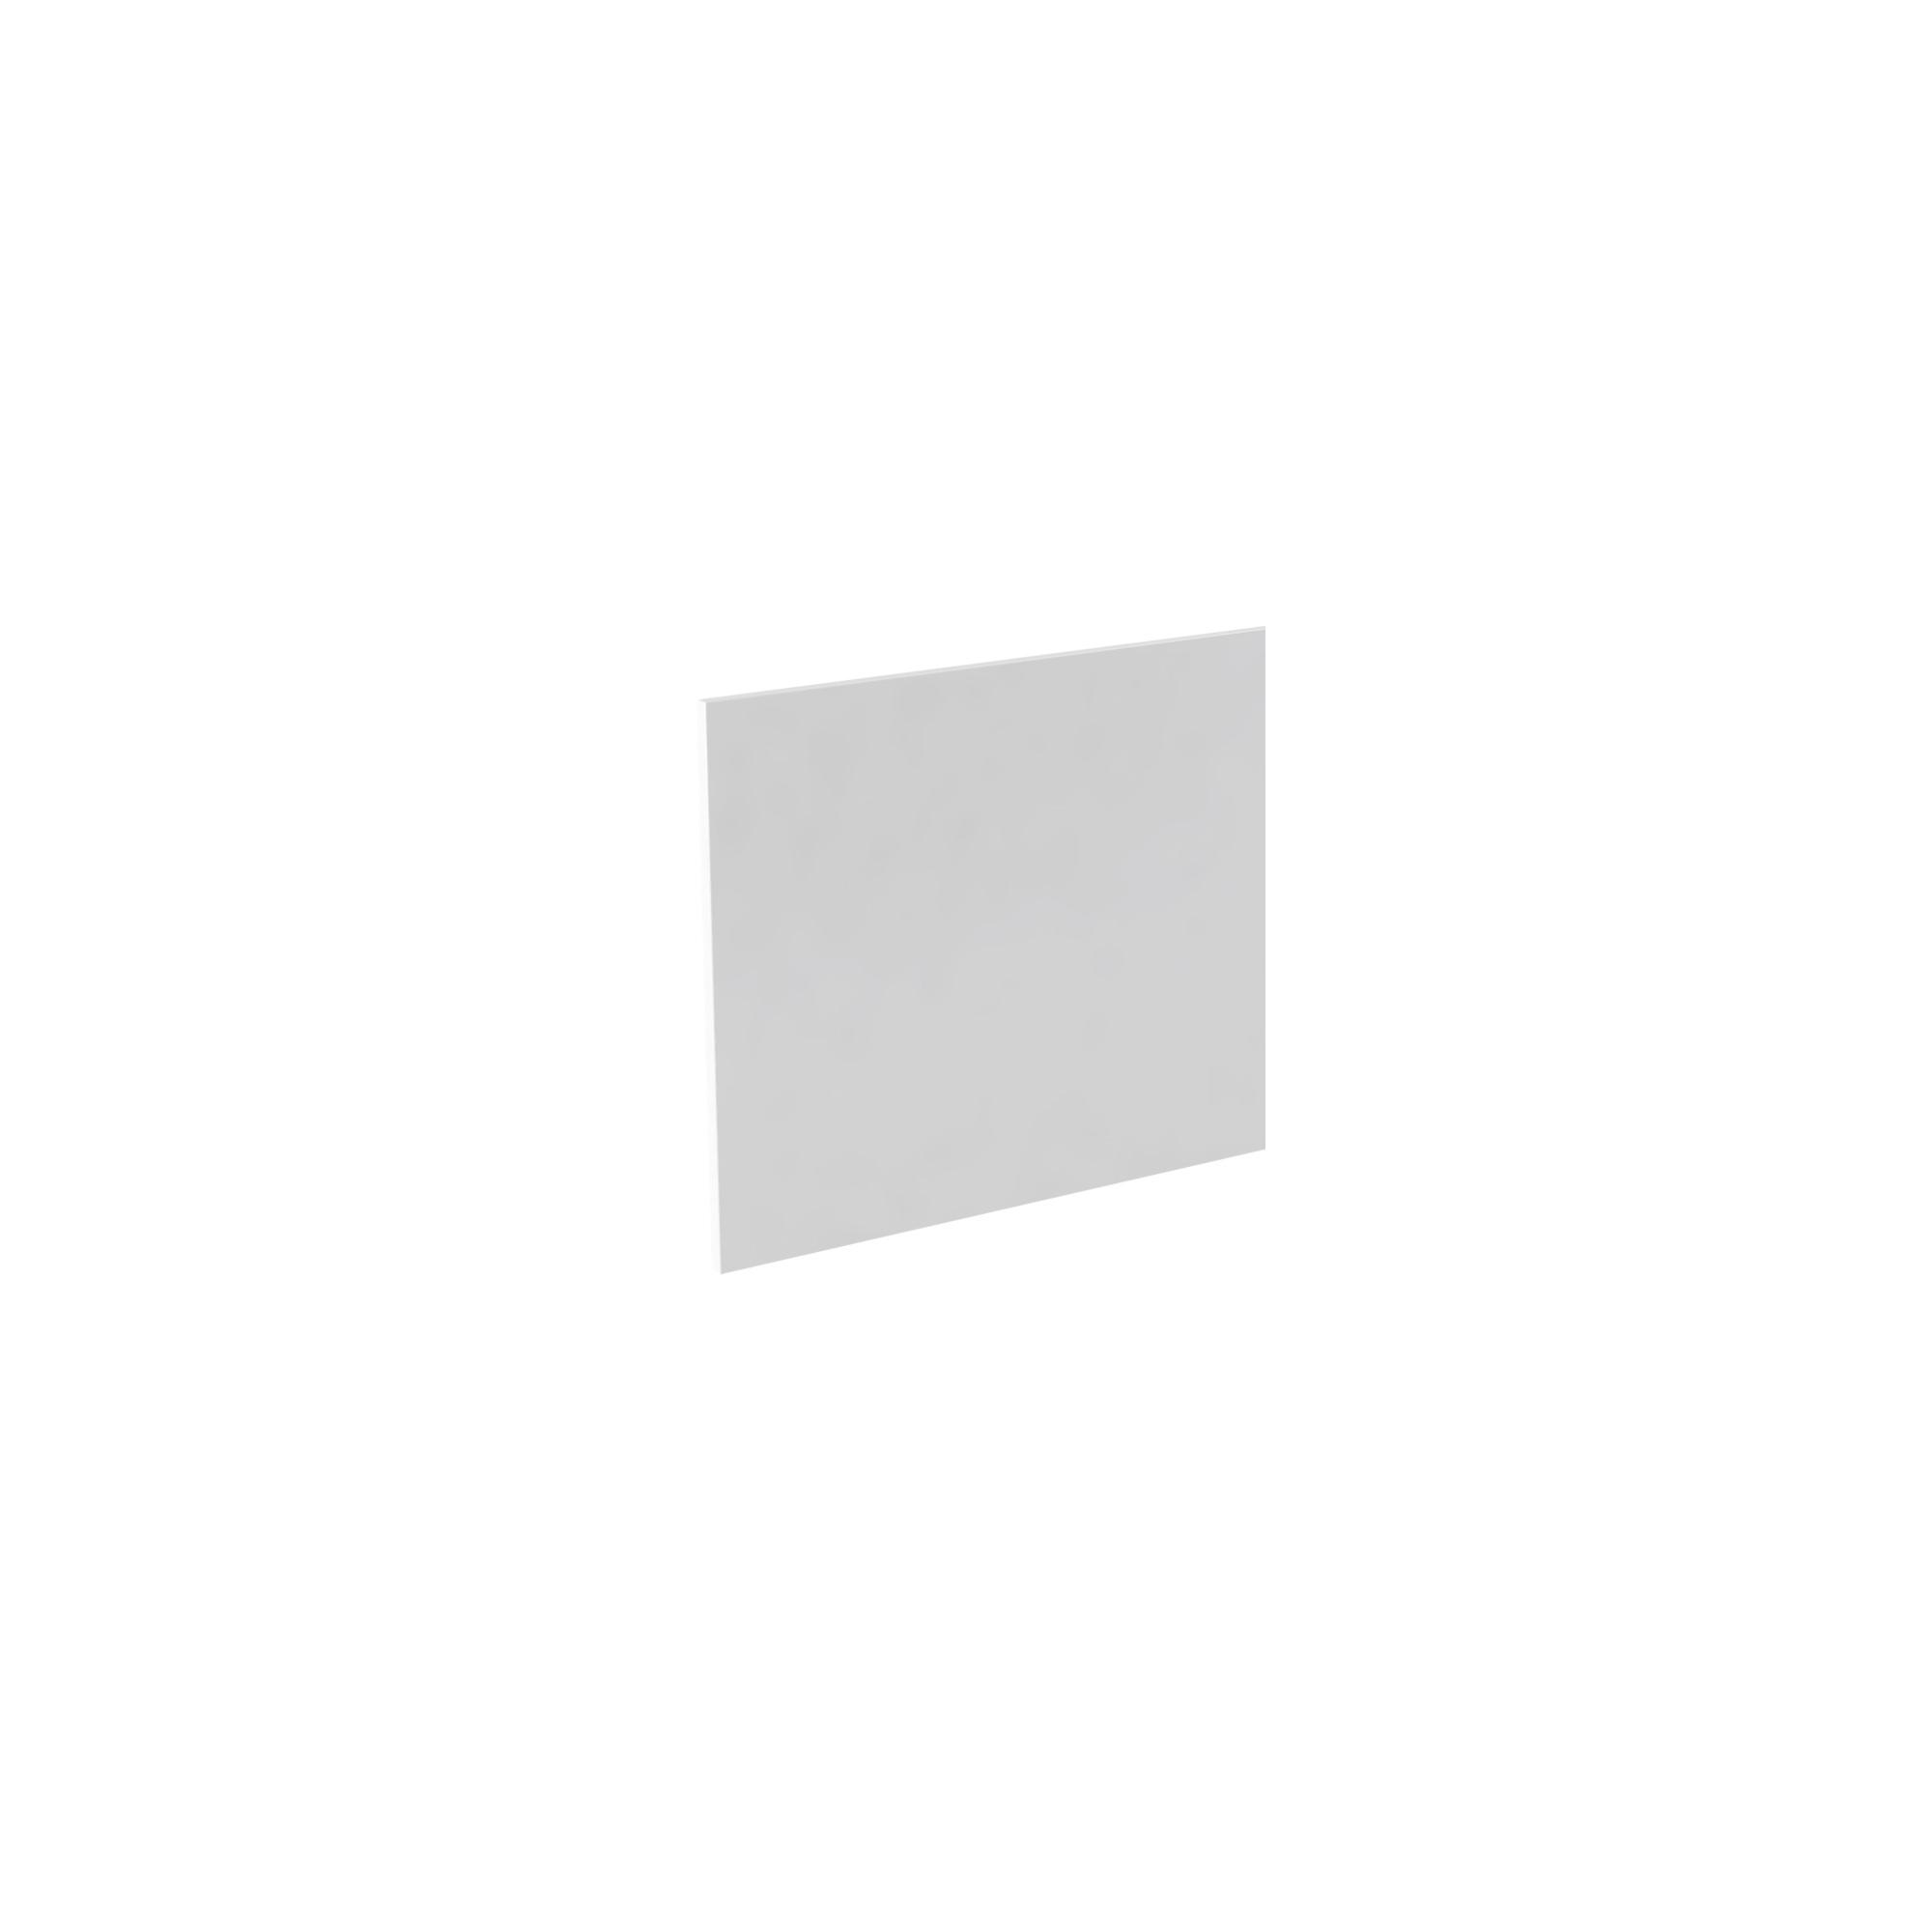 K-Vit Ikon 750mm Bath Panel - White